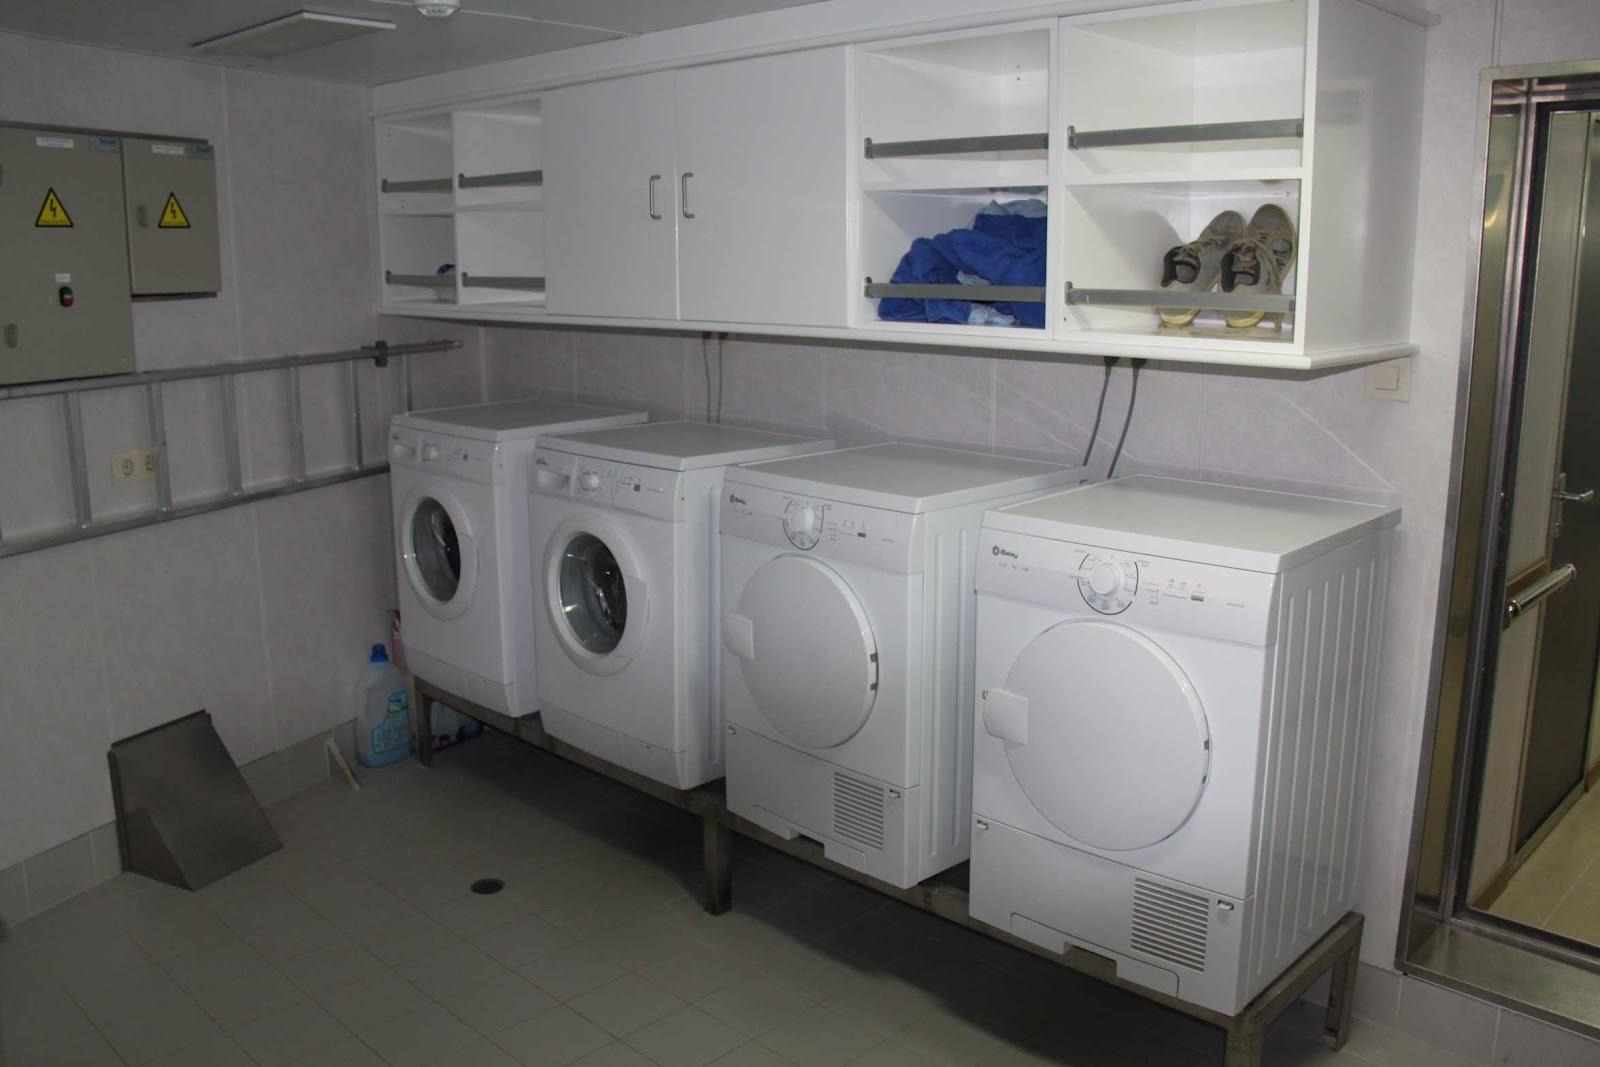 Secadora encima de lavadora interesting interesting amazing conjunto lavadora secadora pwd - Soporte secadora sobre lavadora ...